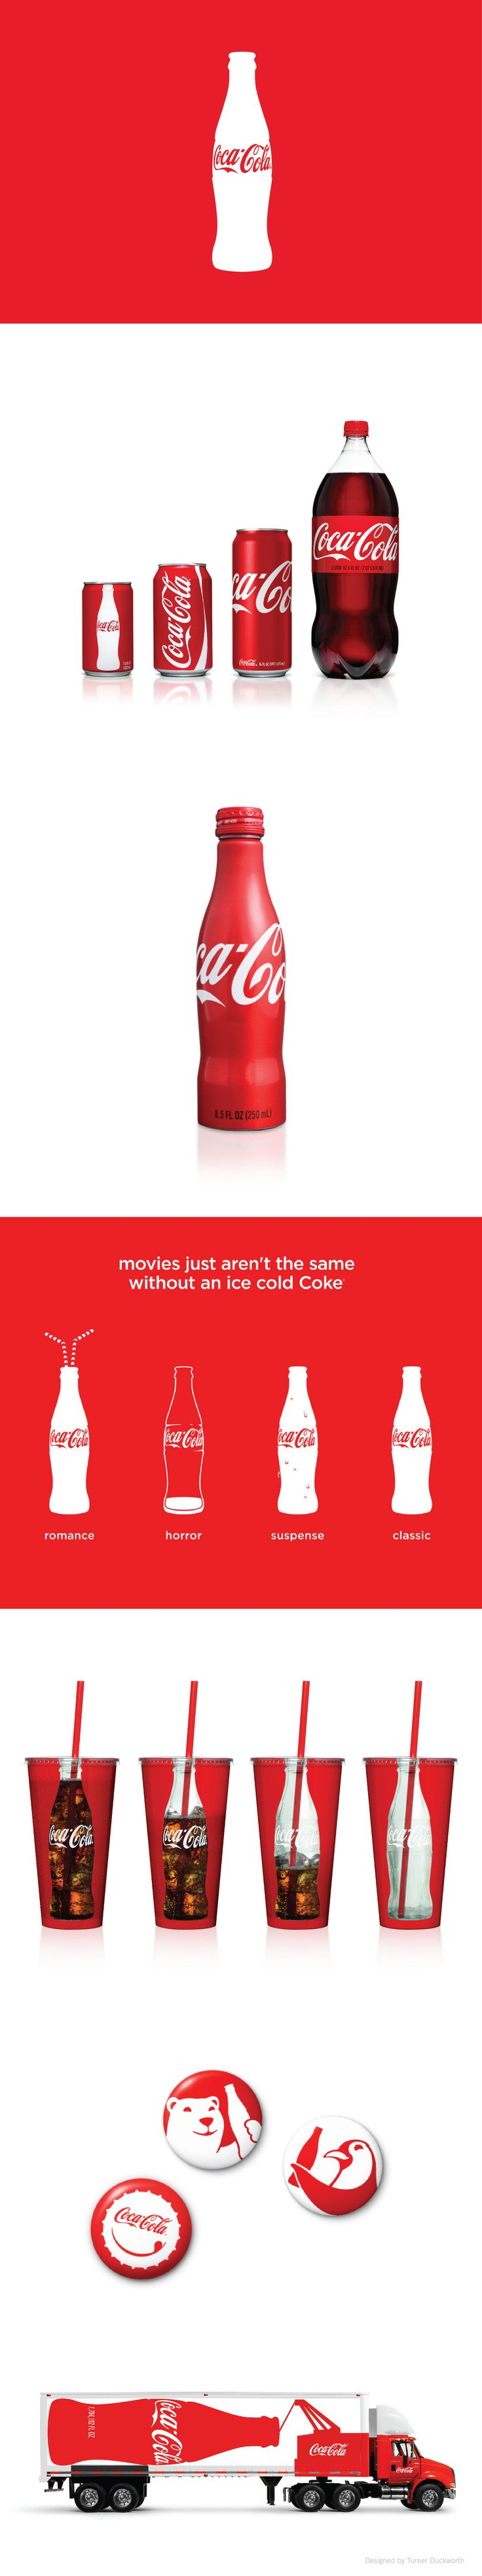 Coca-Cola visual identity. Designed by Turner Duckworth.